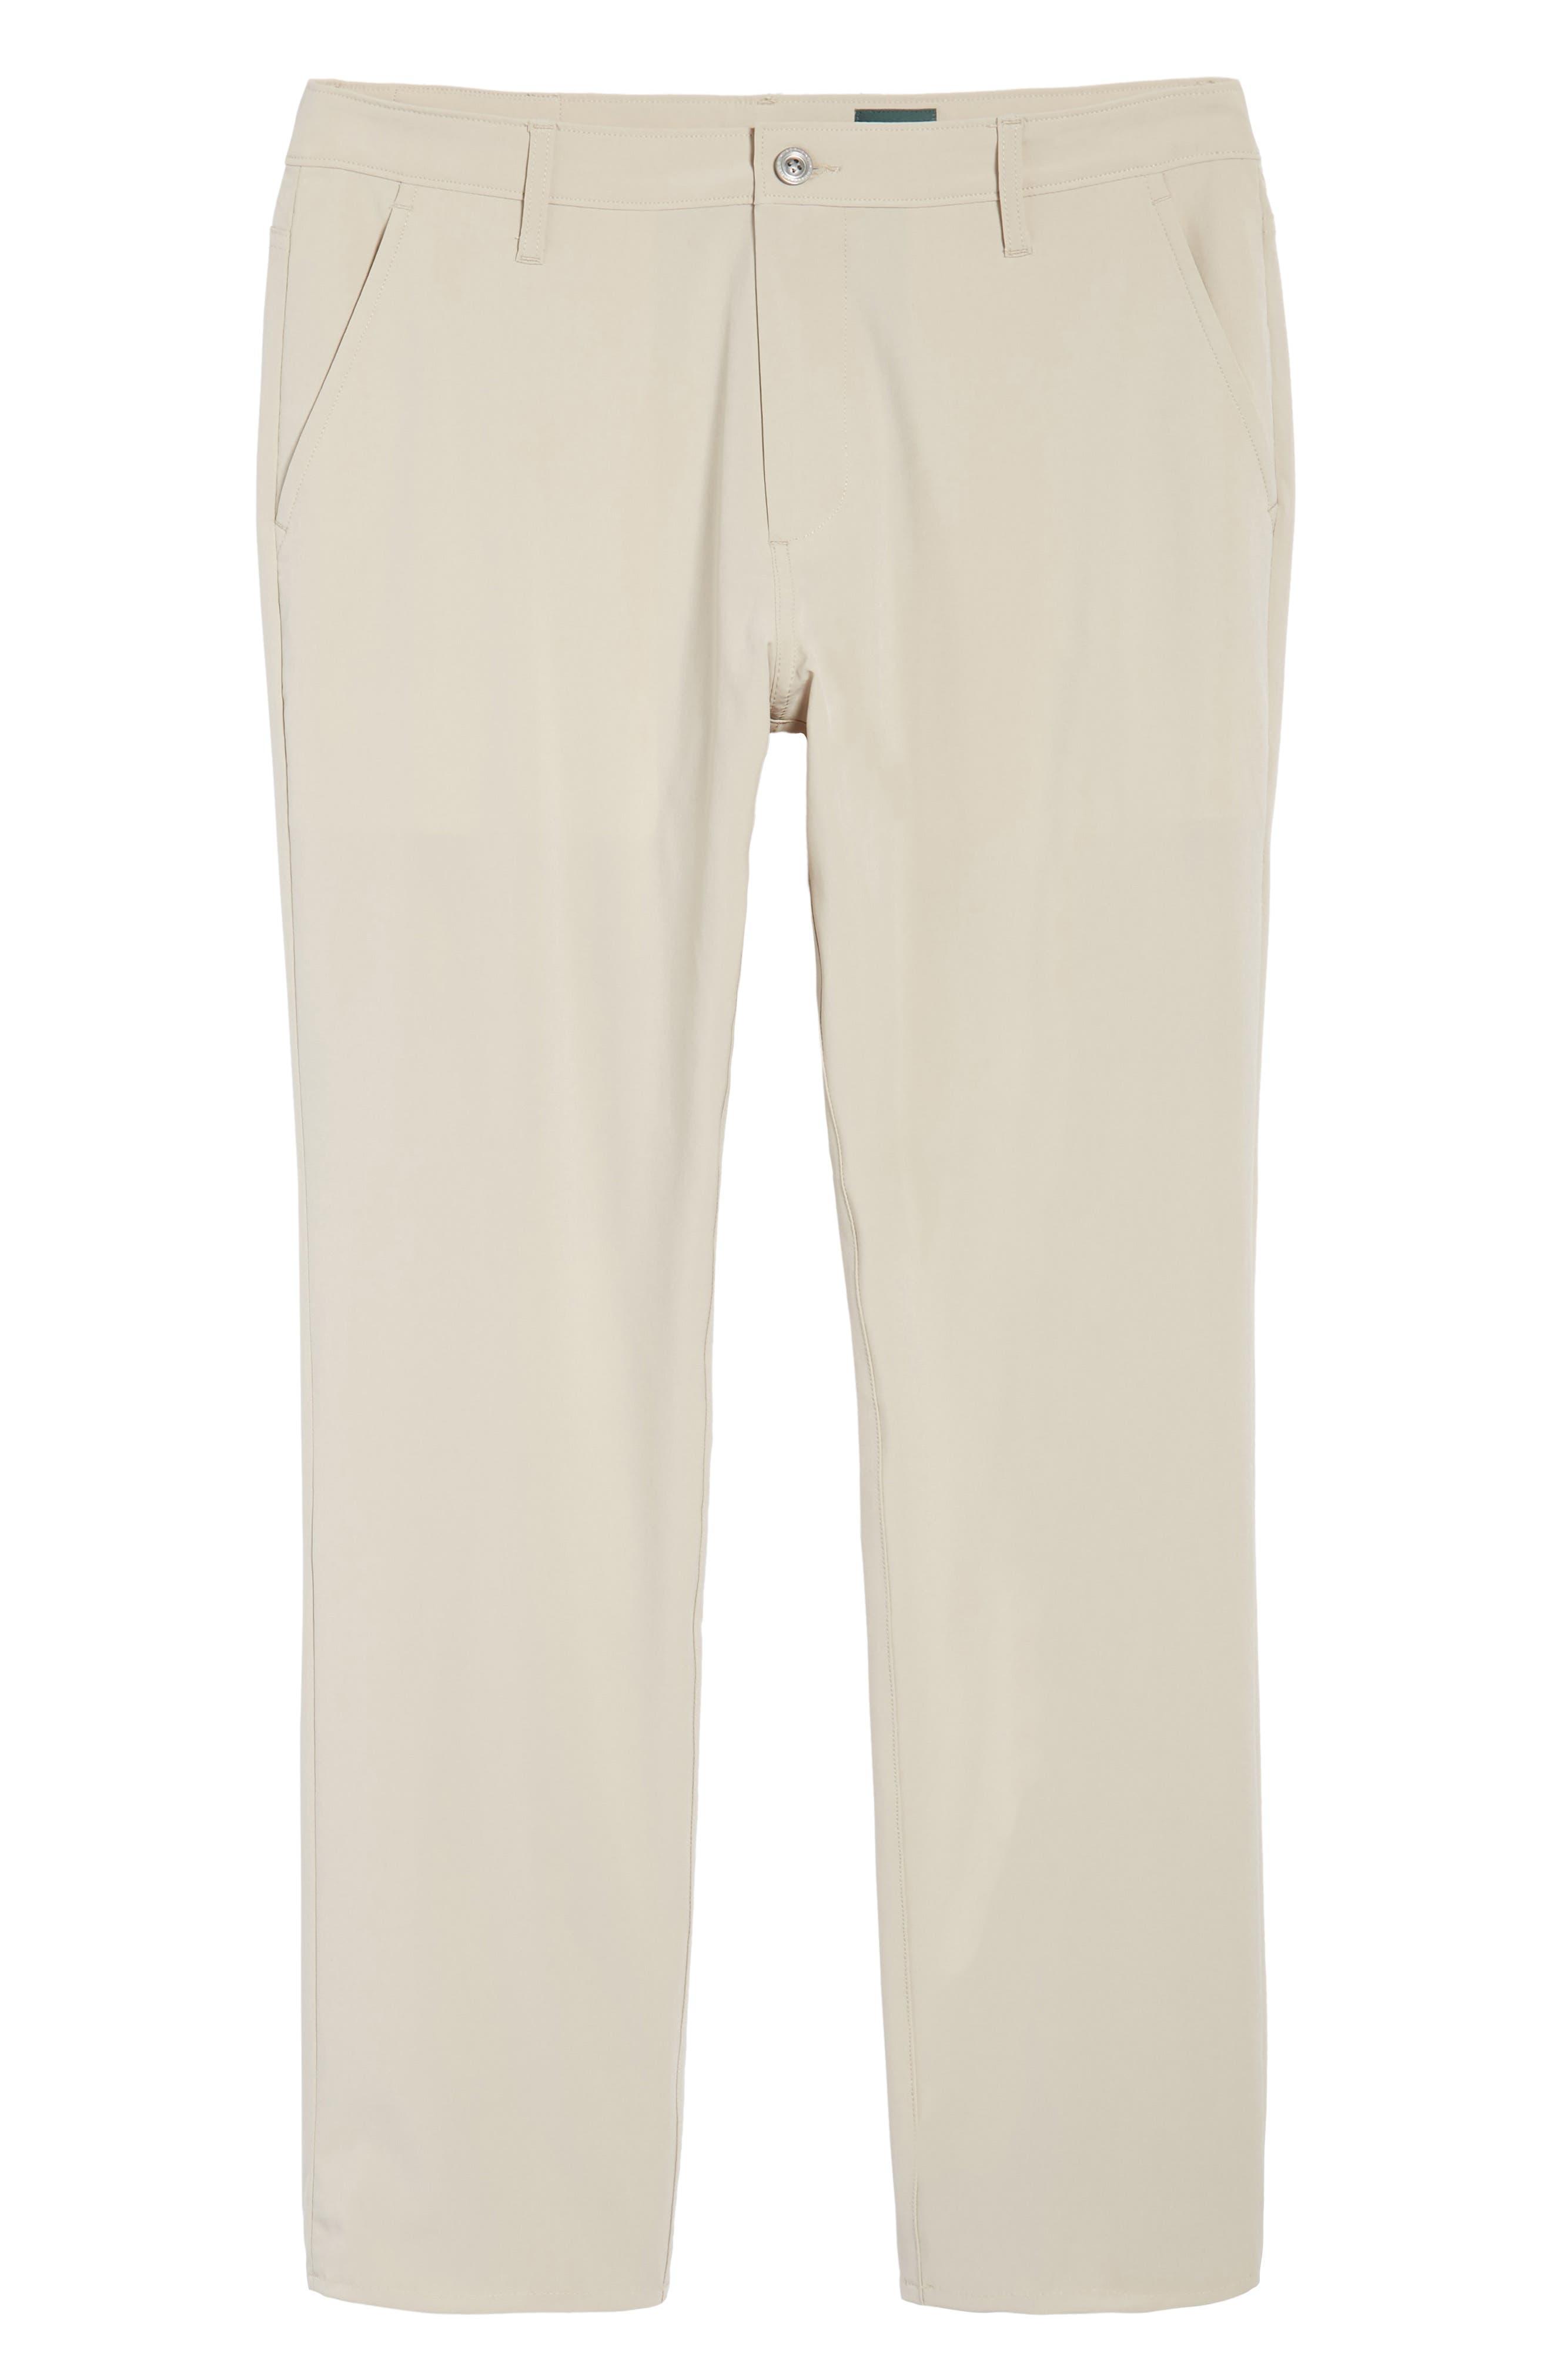 The Graduate Trousers,                         Main,                         color, Desert Beige